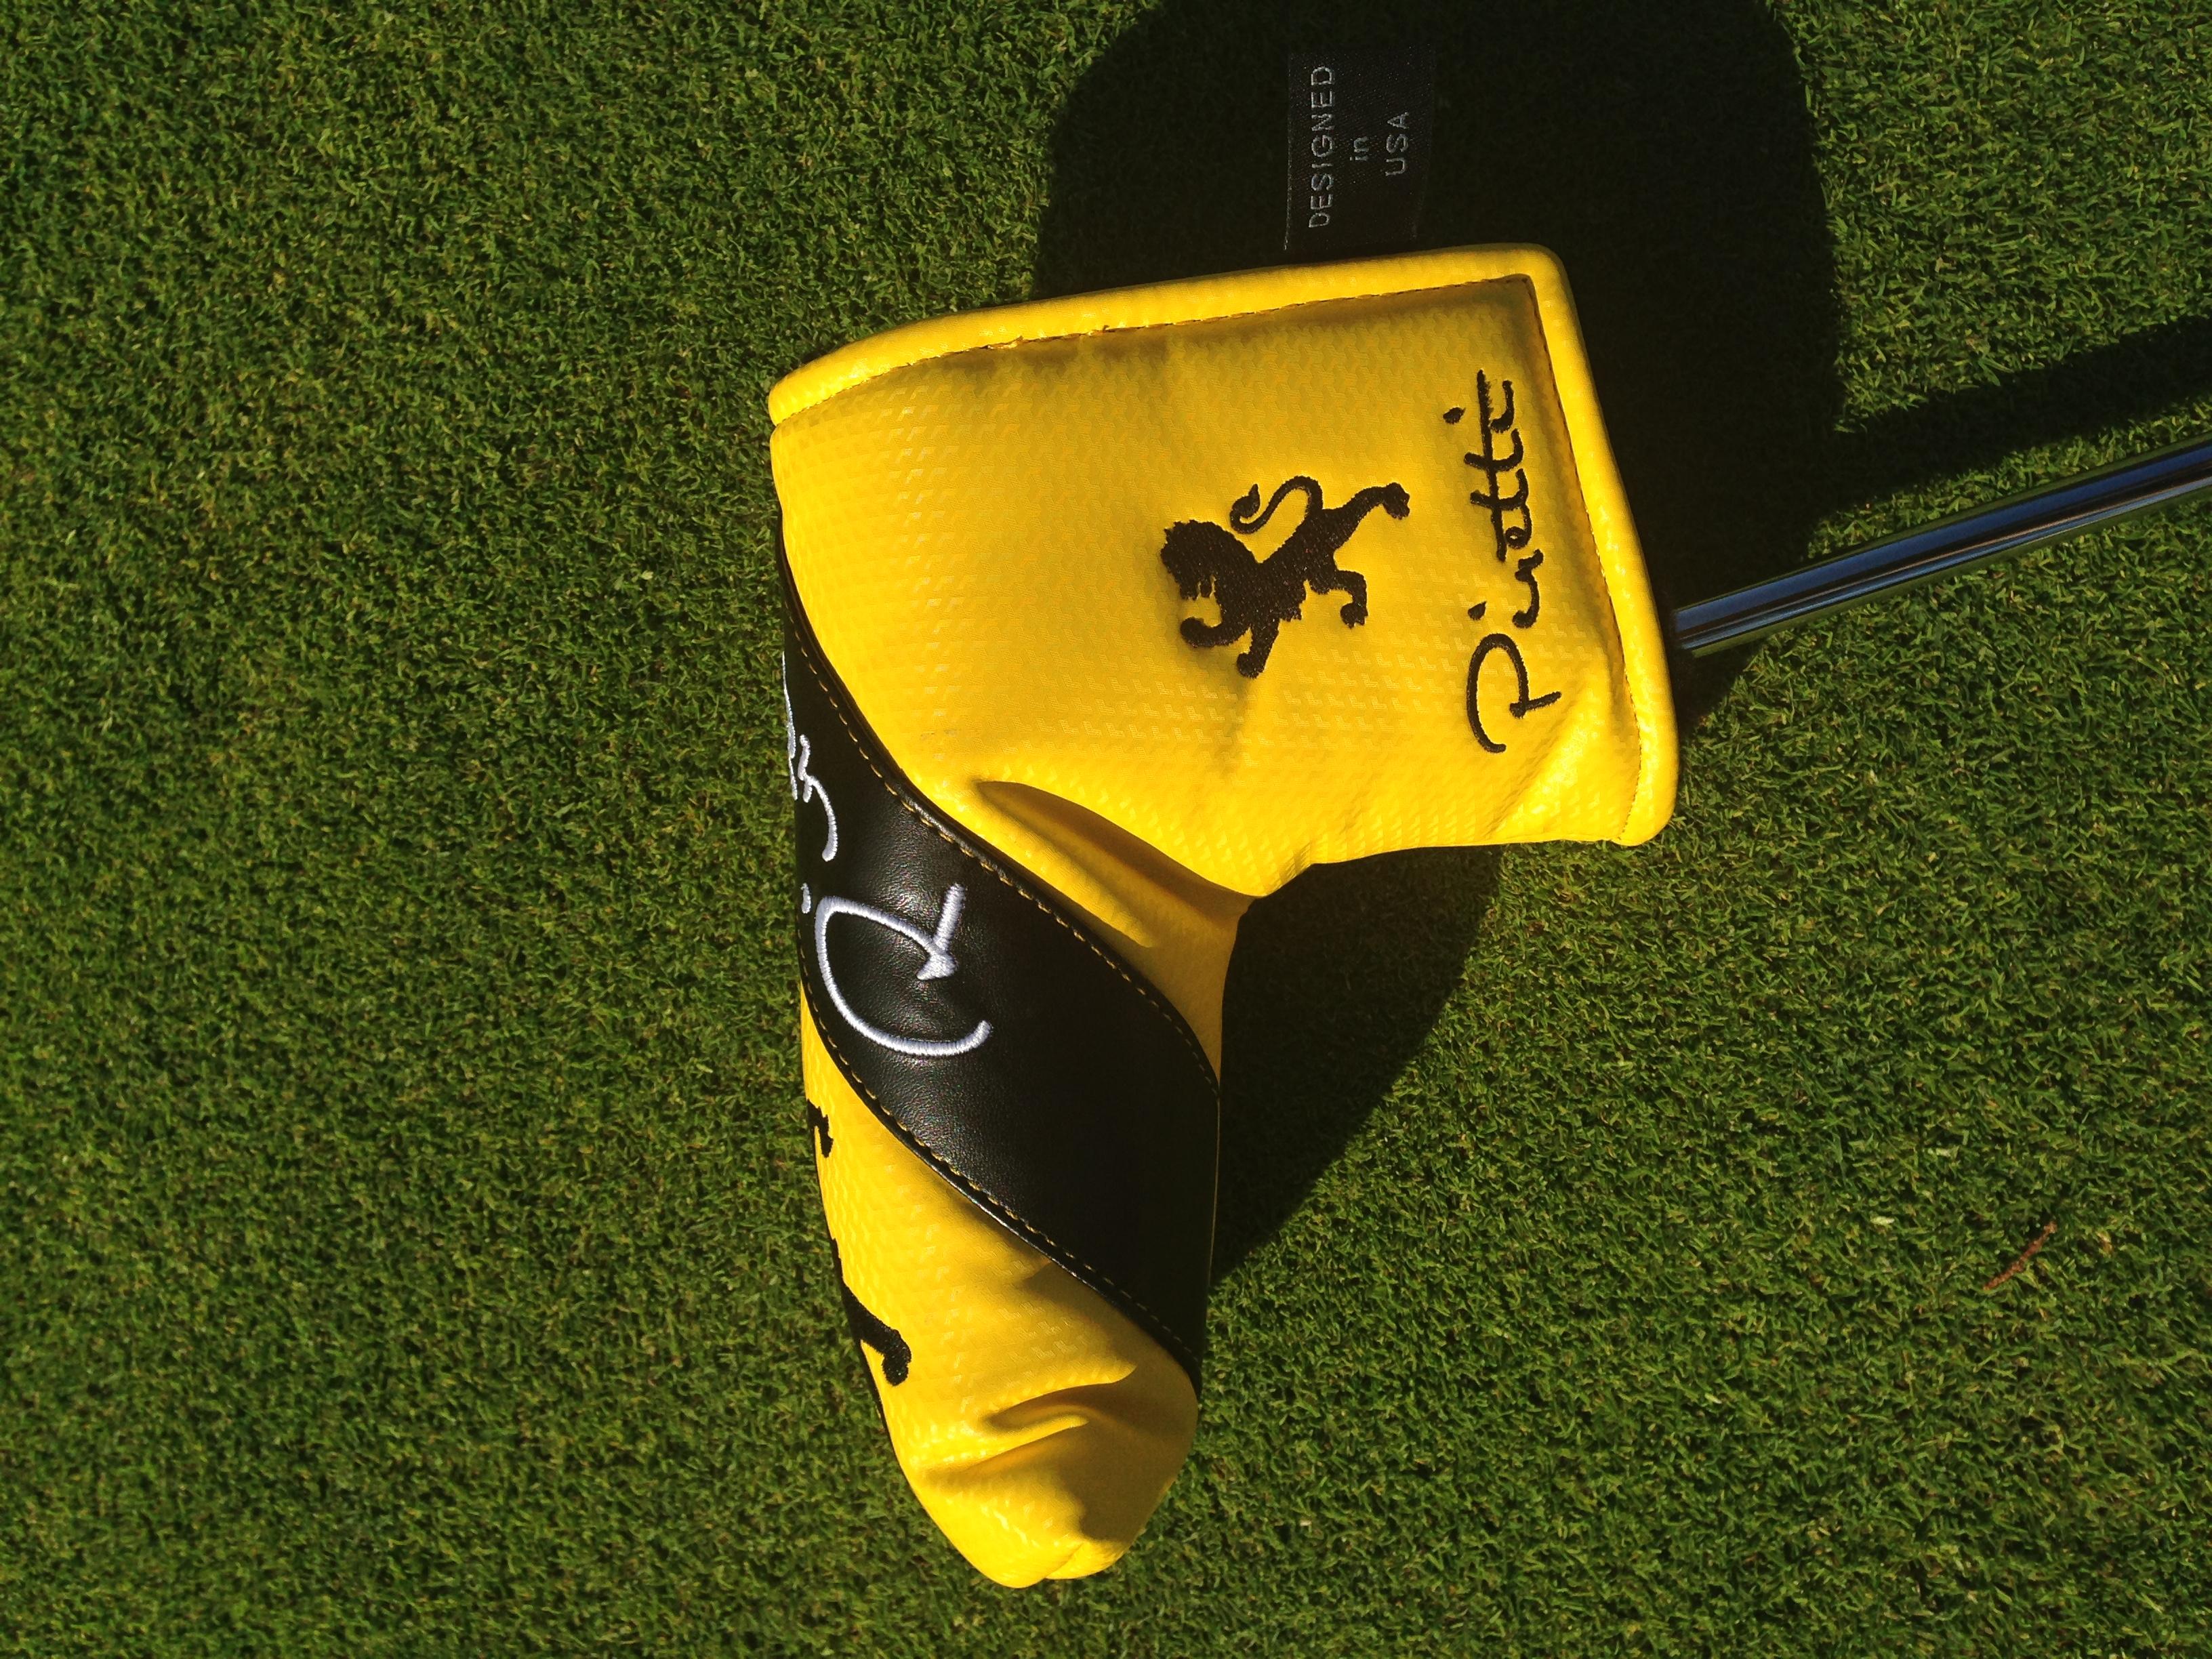 piretti golf review josh hirst pga professional